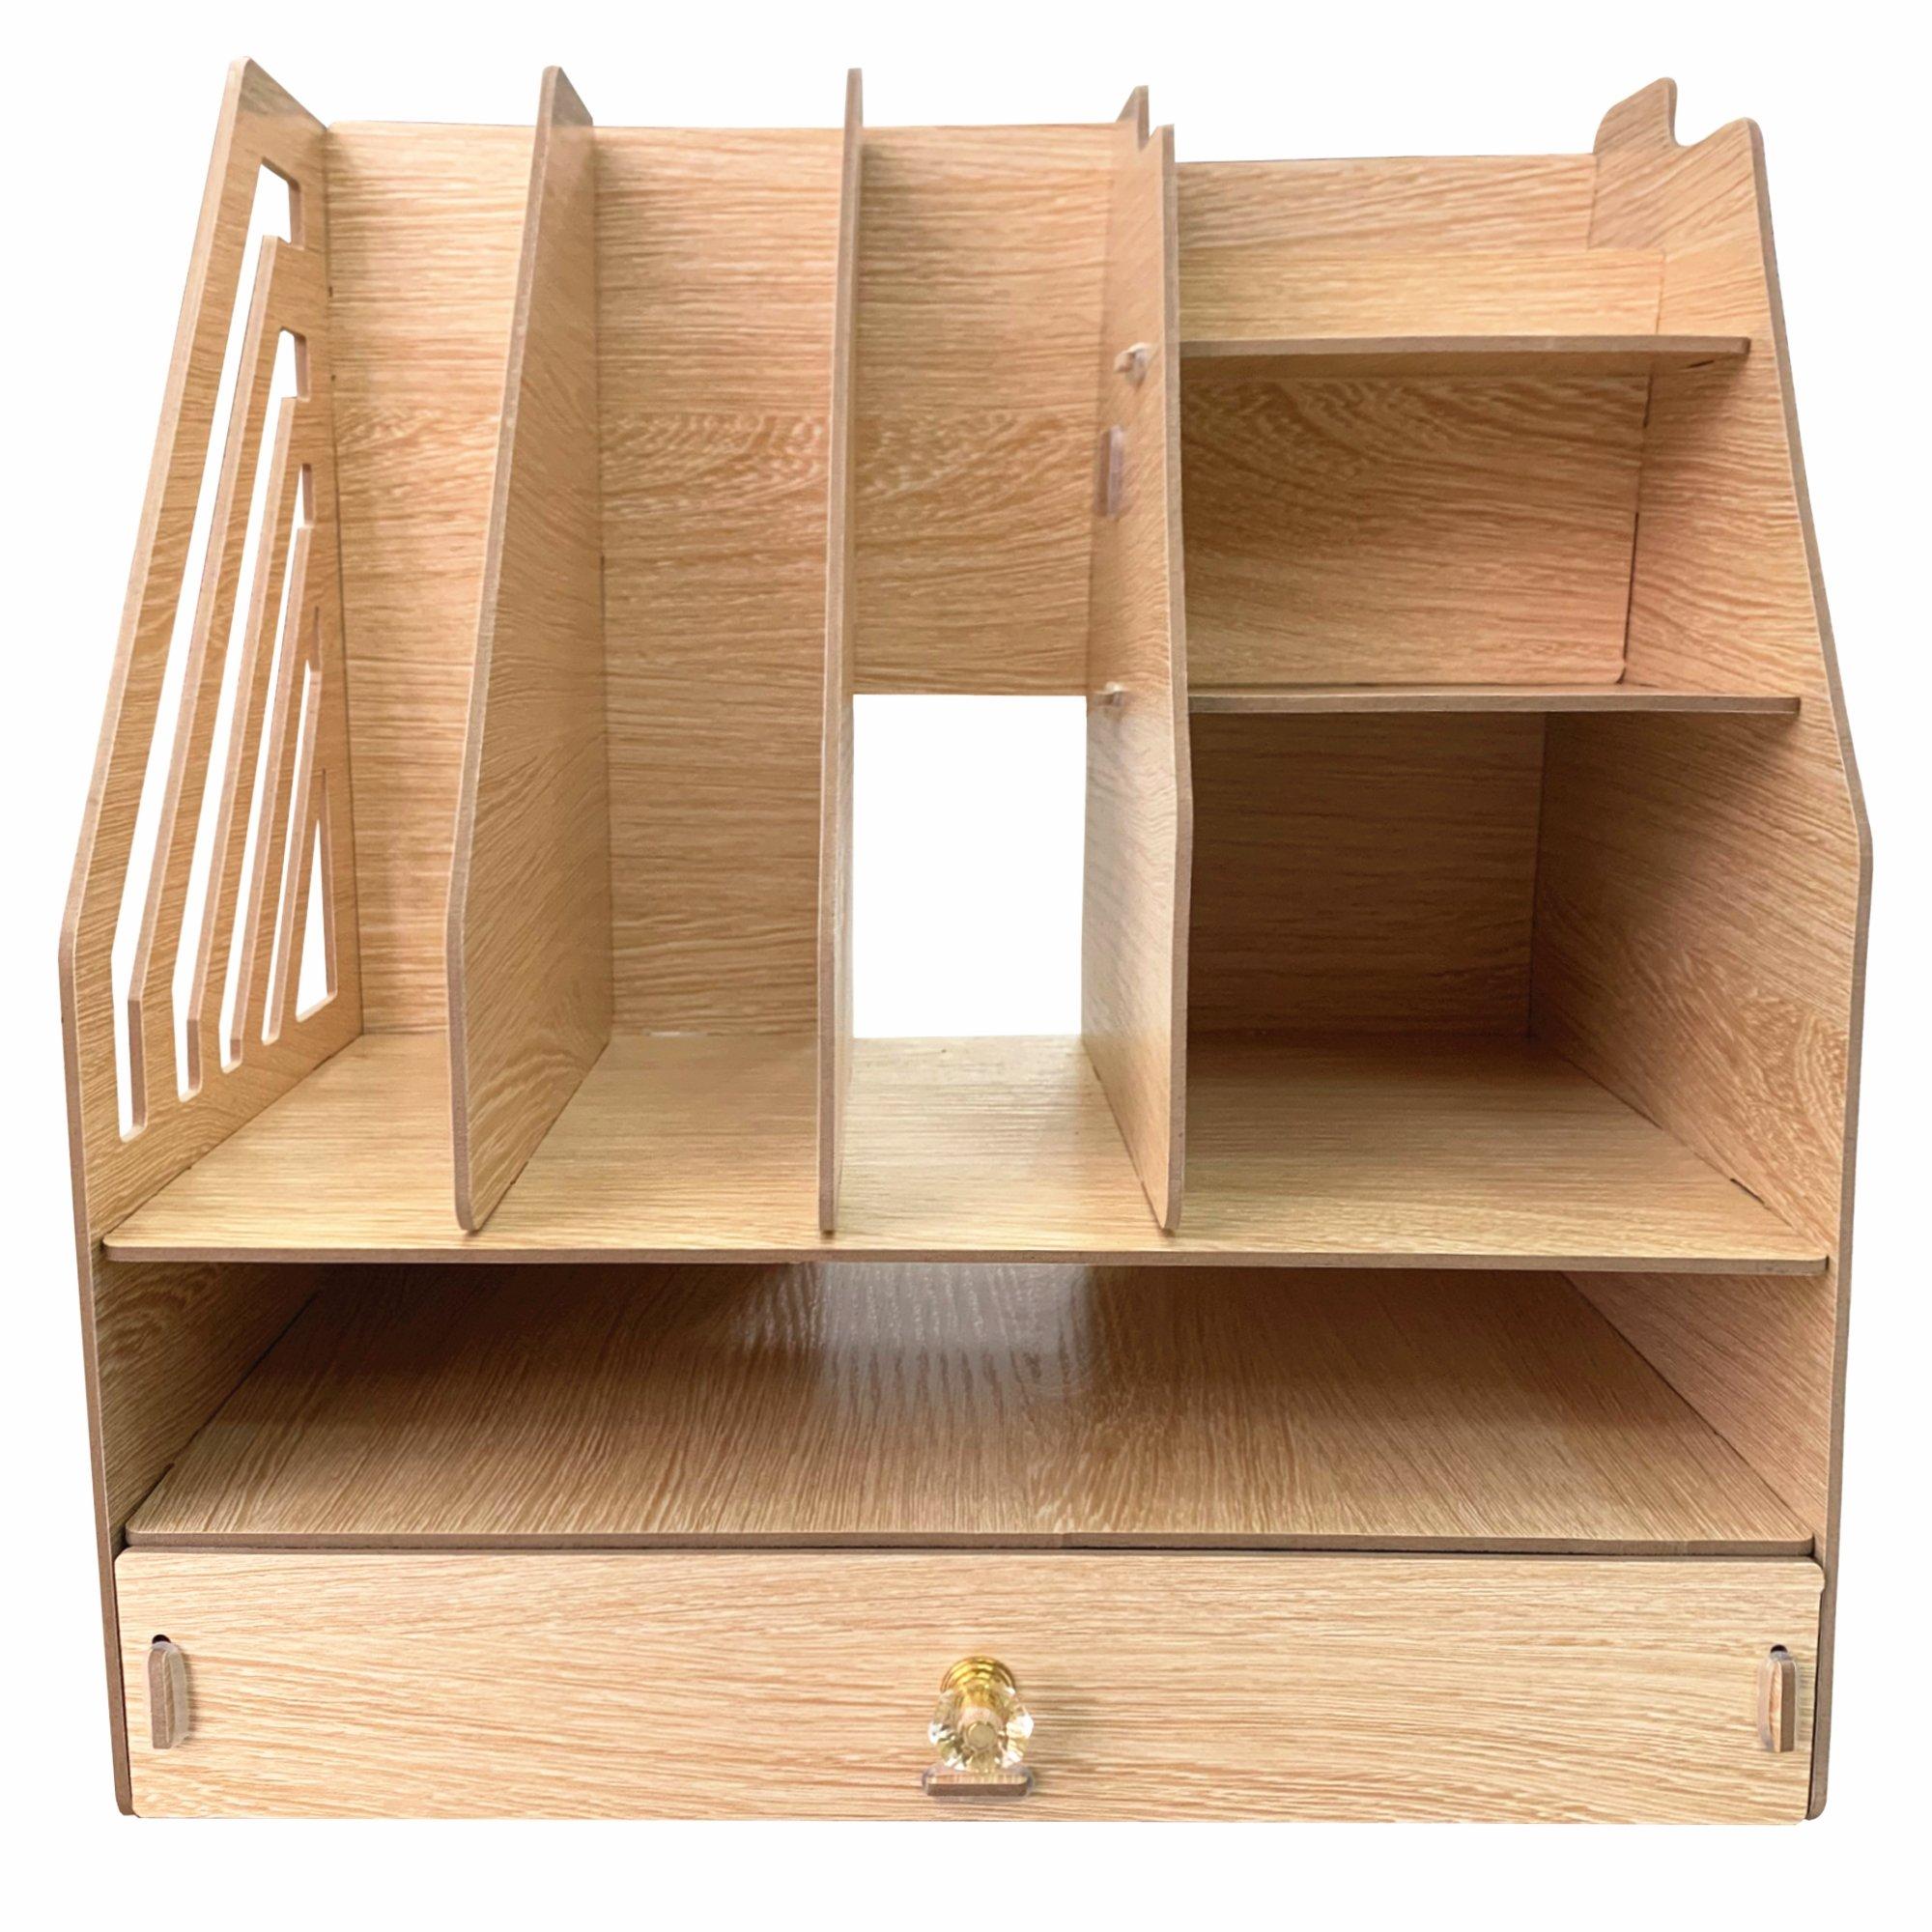 DIY Desk Organizer with Drawer